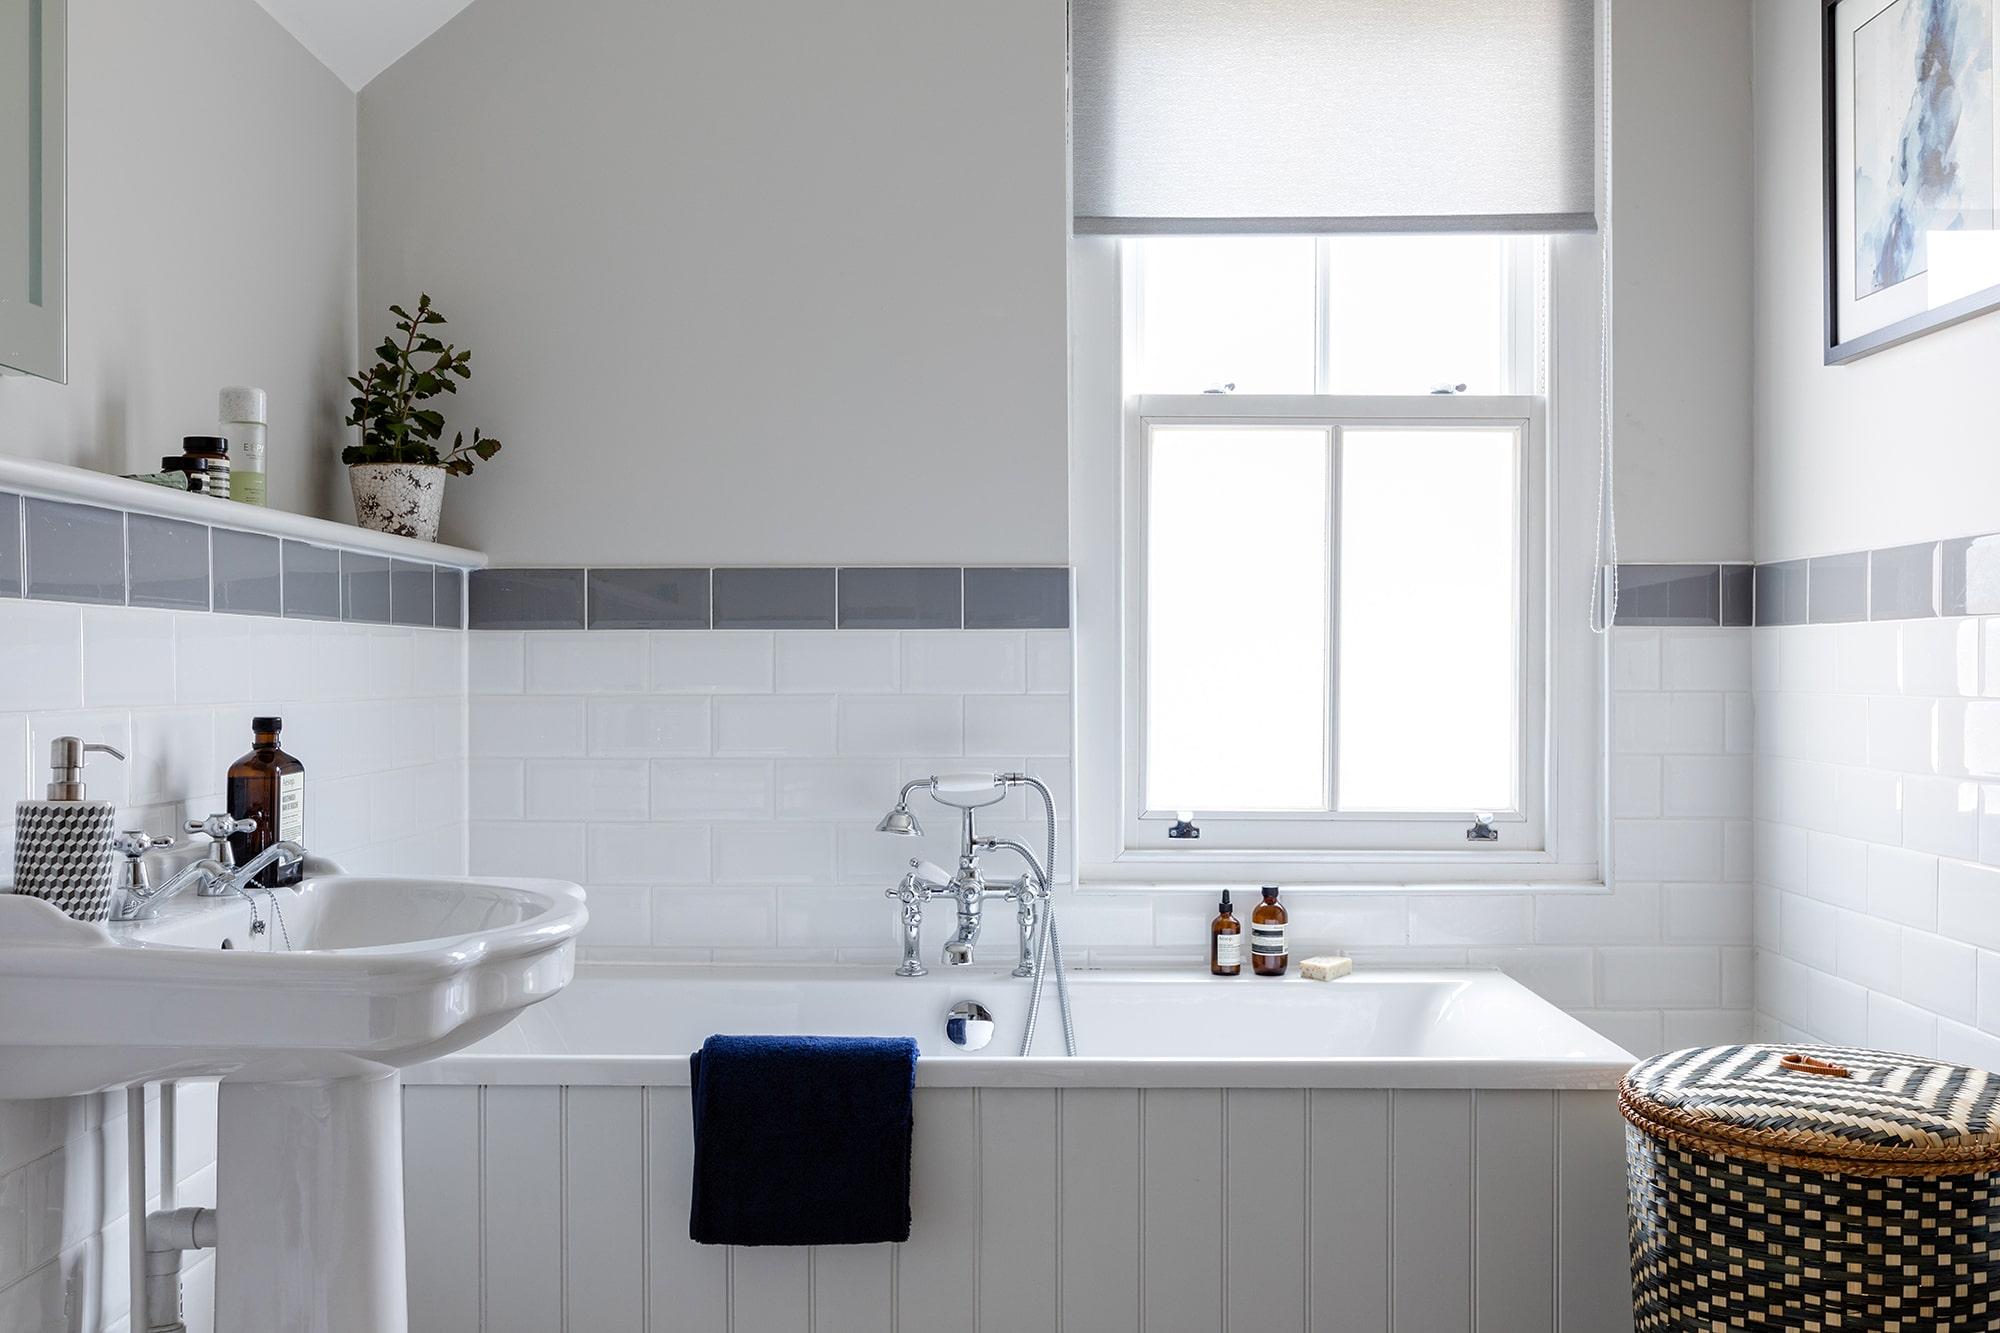 interior design photo of a bathroom with a window: bath tub and a sink